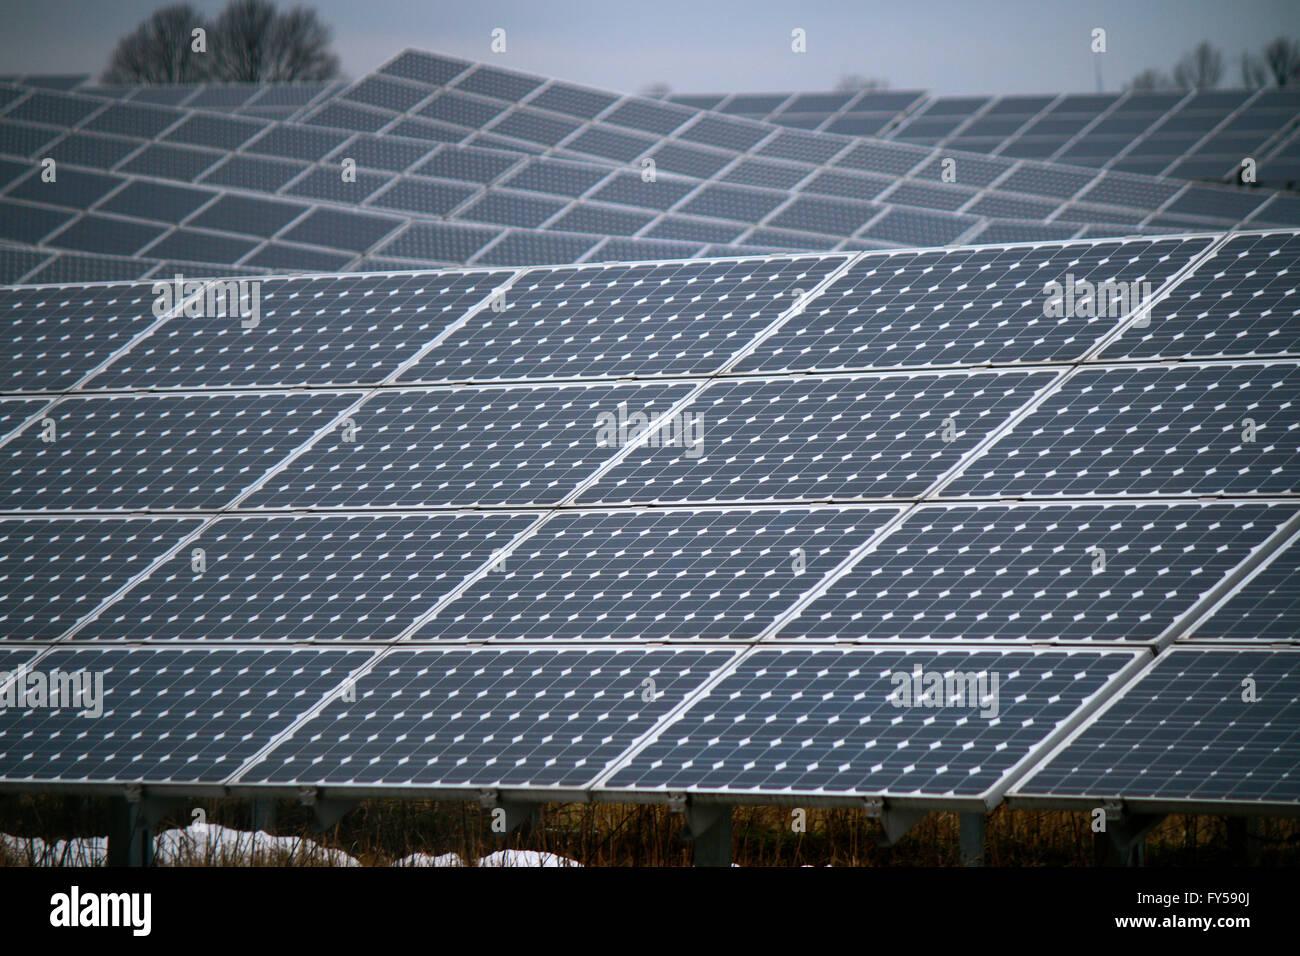 Solaranlage, Berlin. - Stock Image